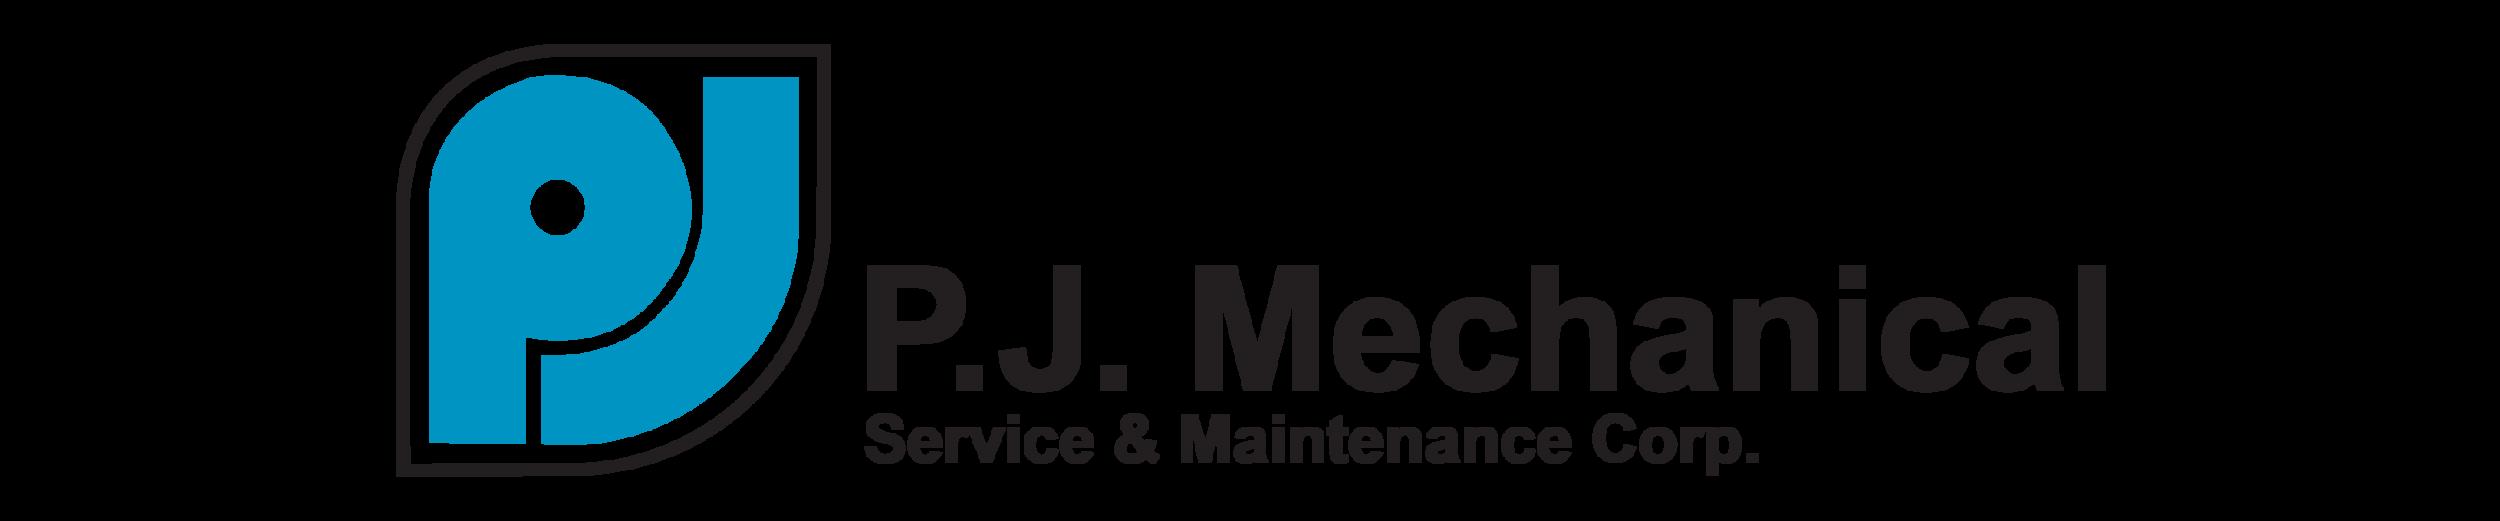 服务Logo_2.1.png